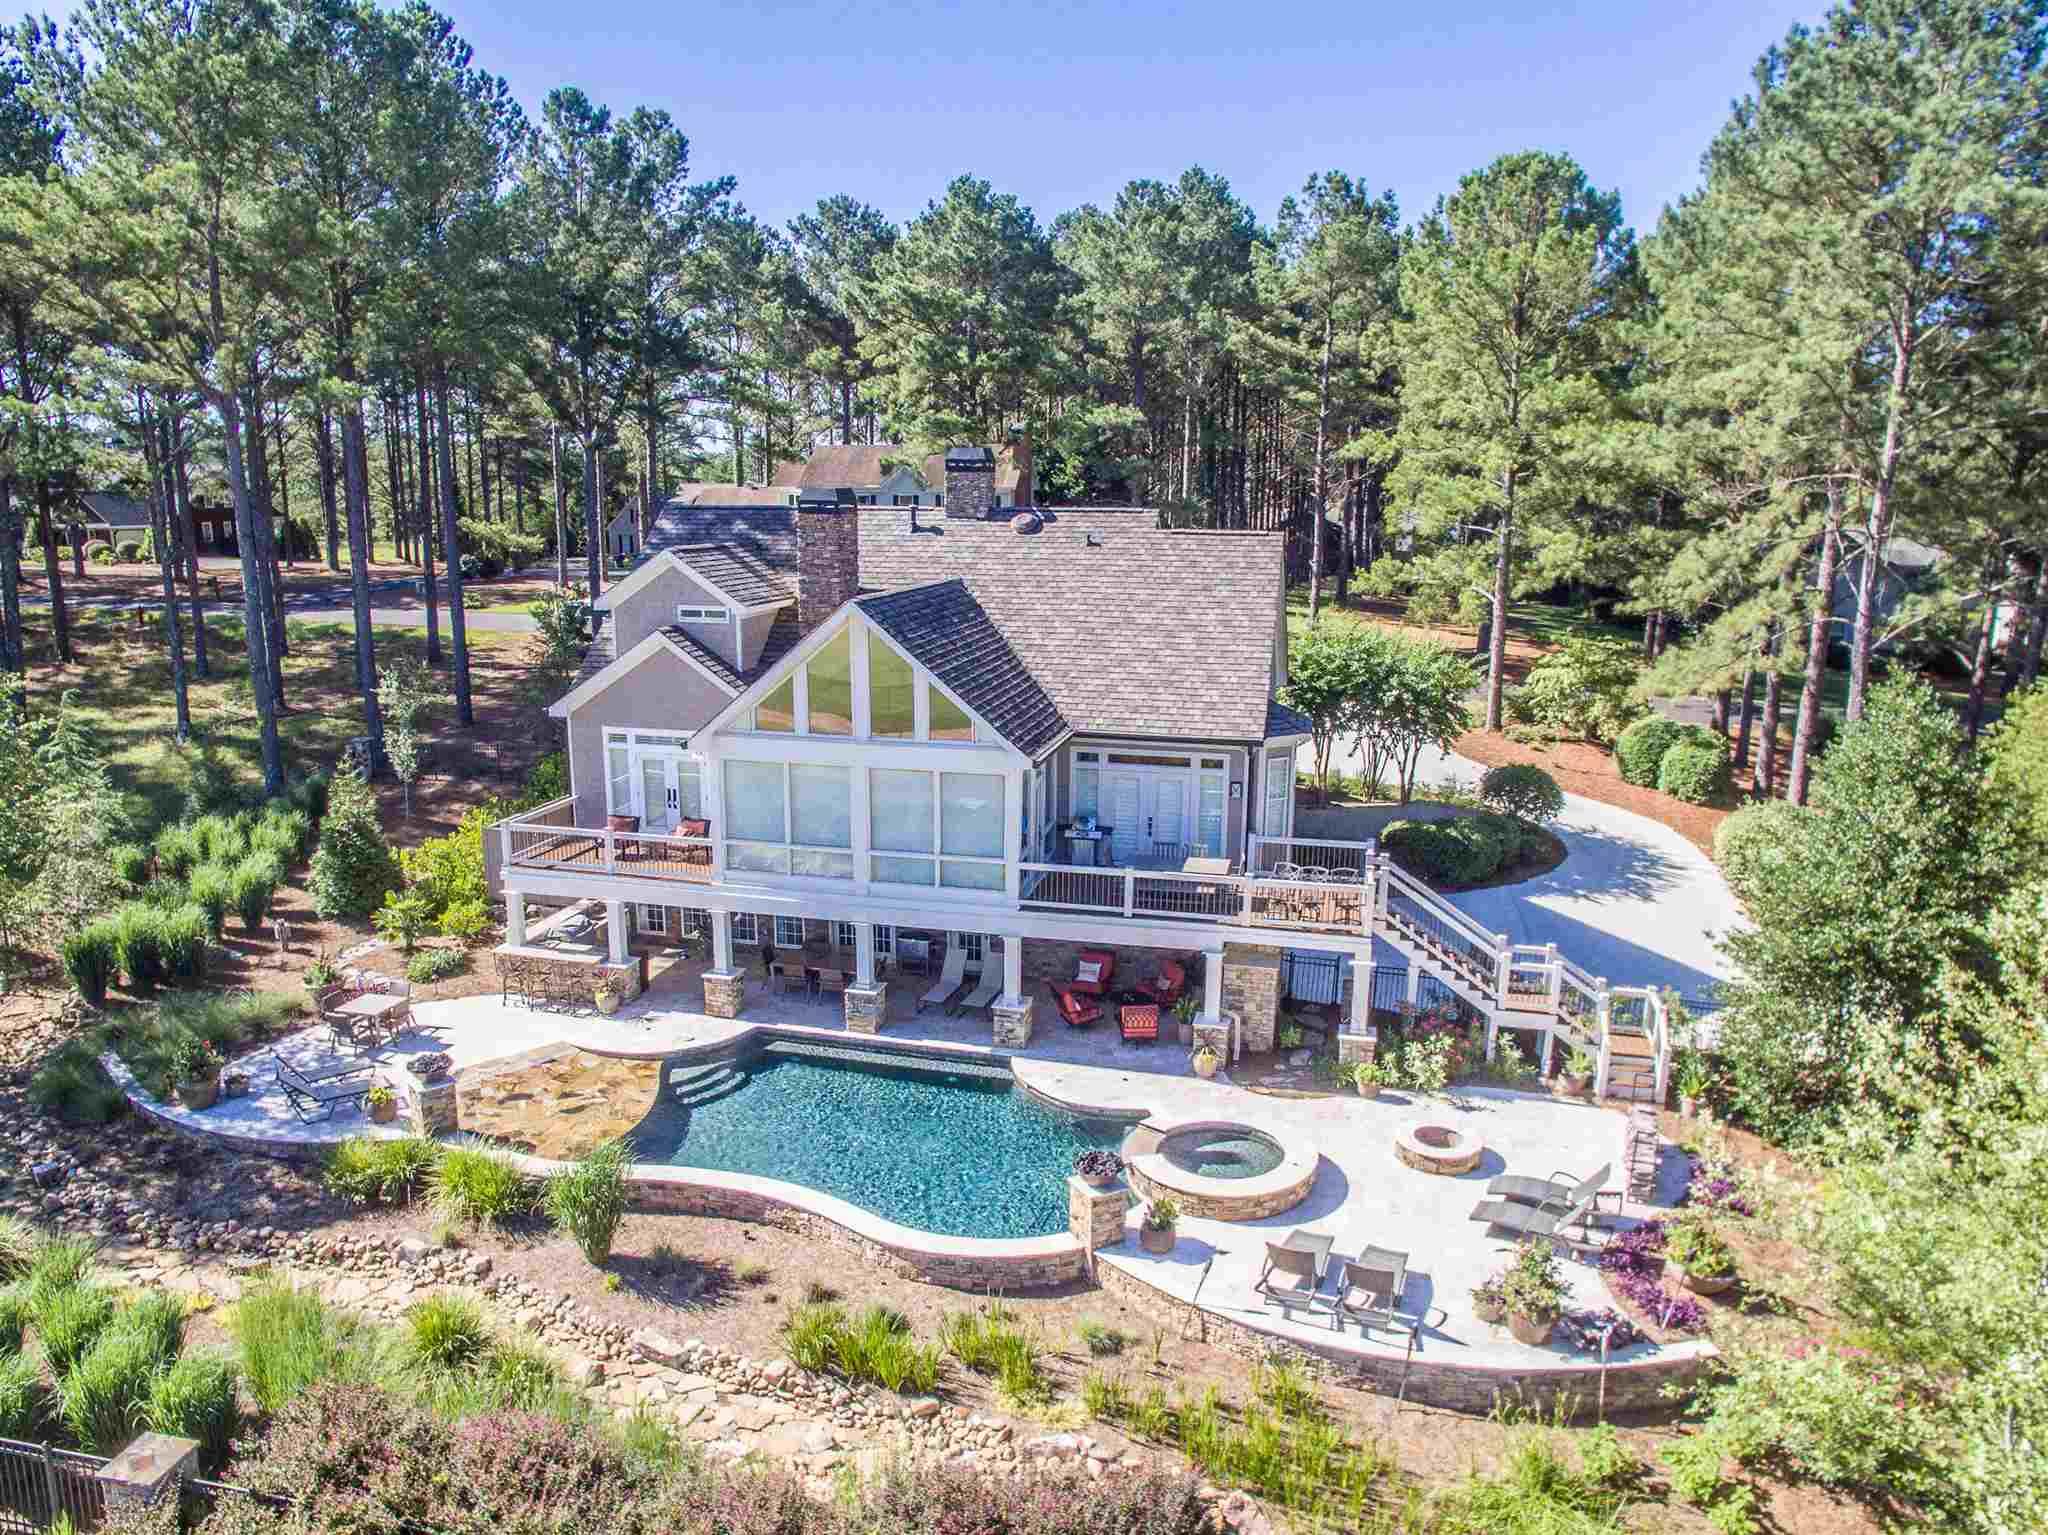 118 OKONI LANE, Cuscowilla, Georgia 4 Bedroom as one of Homes & Land Real Estate